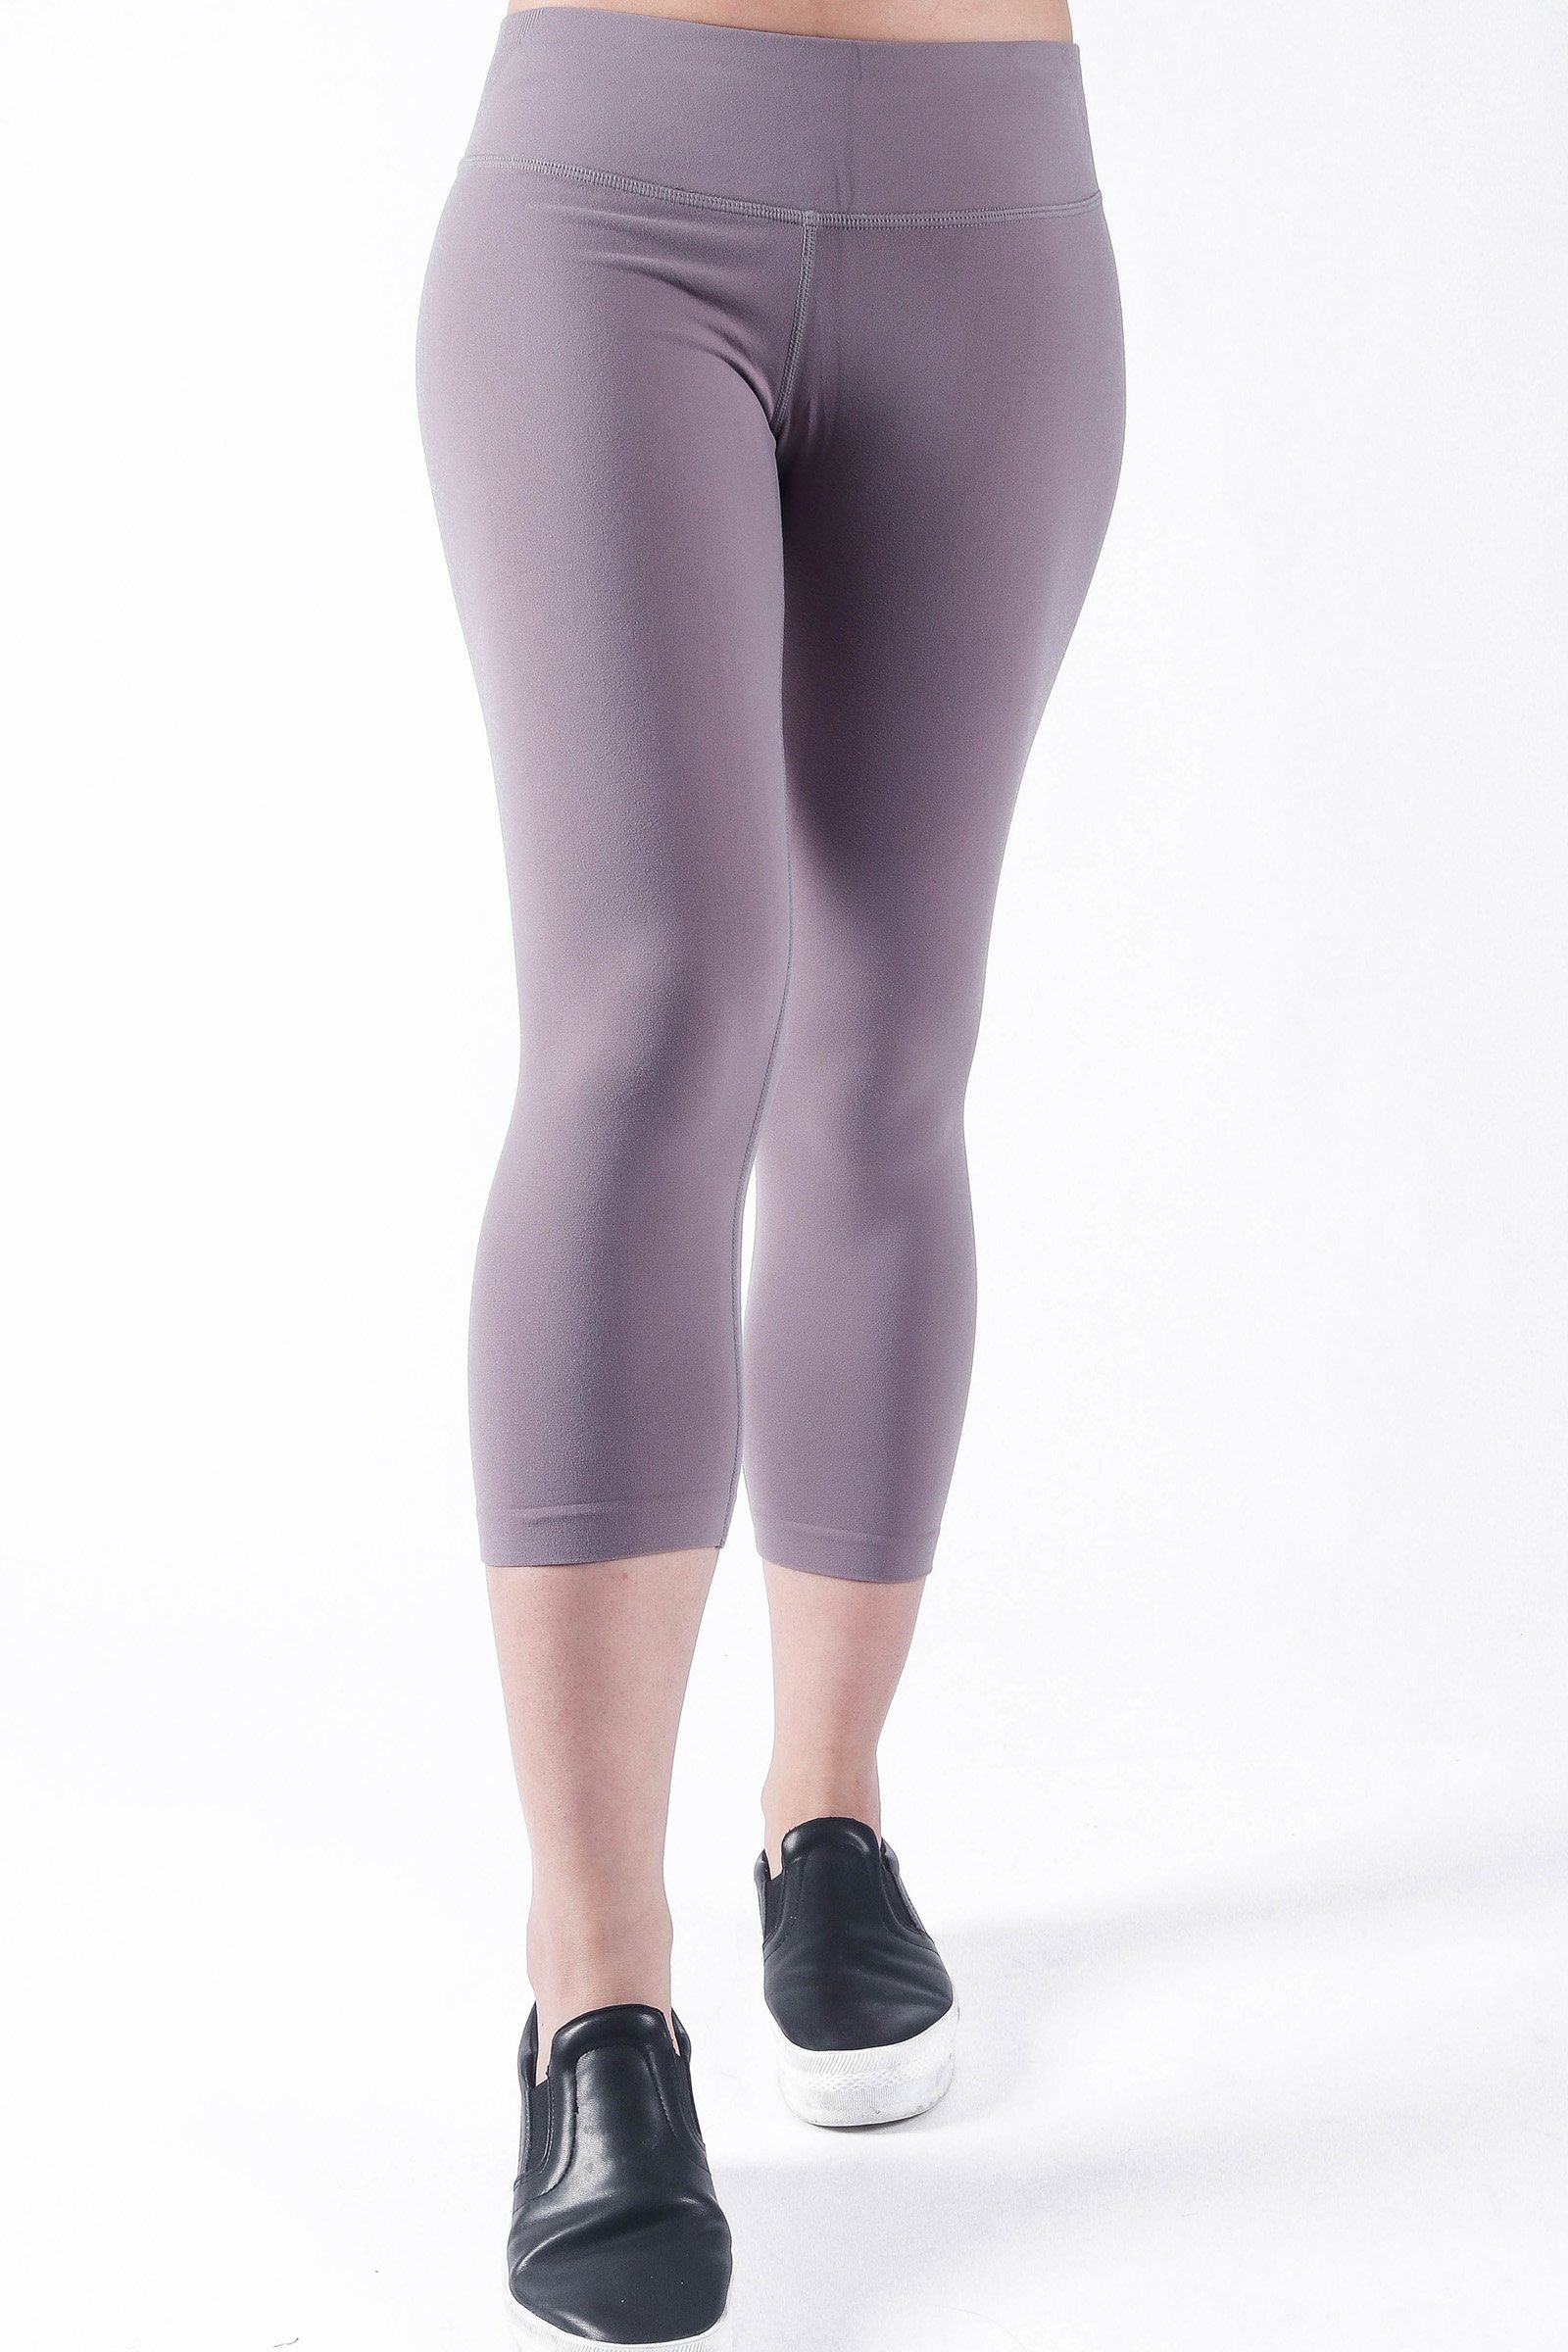 lavendercapris2.jpg